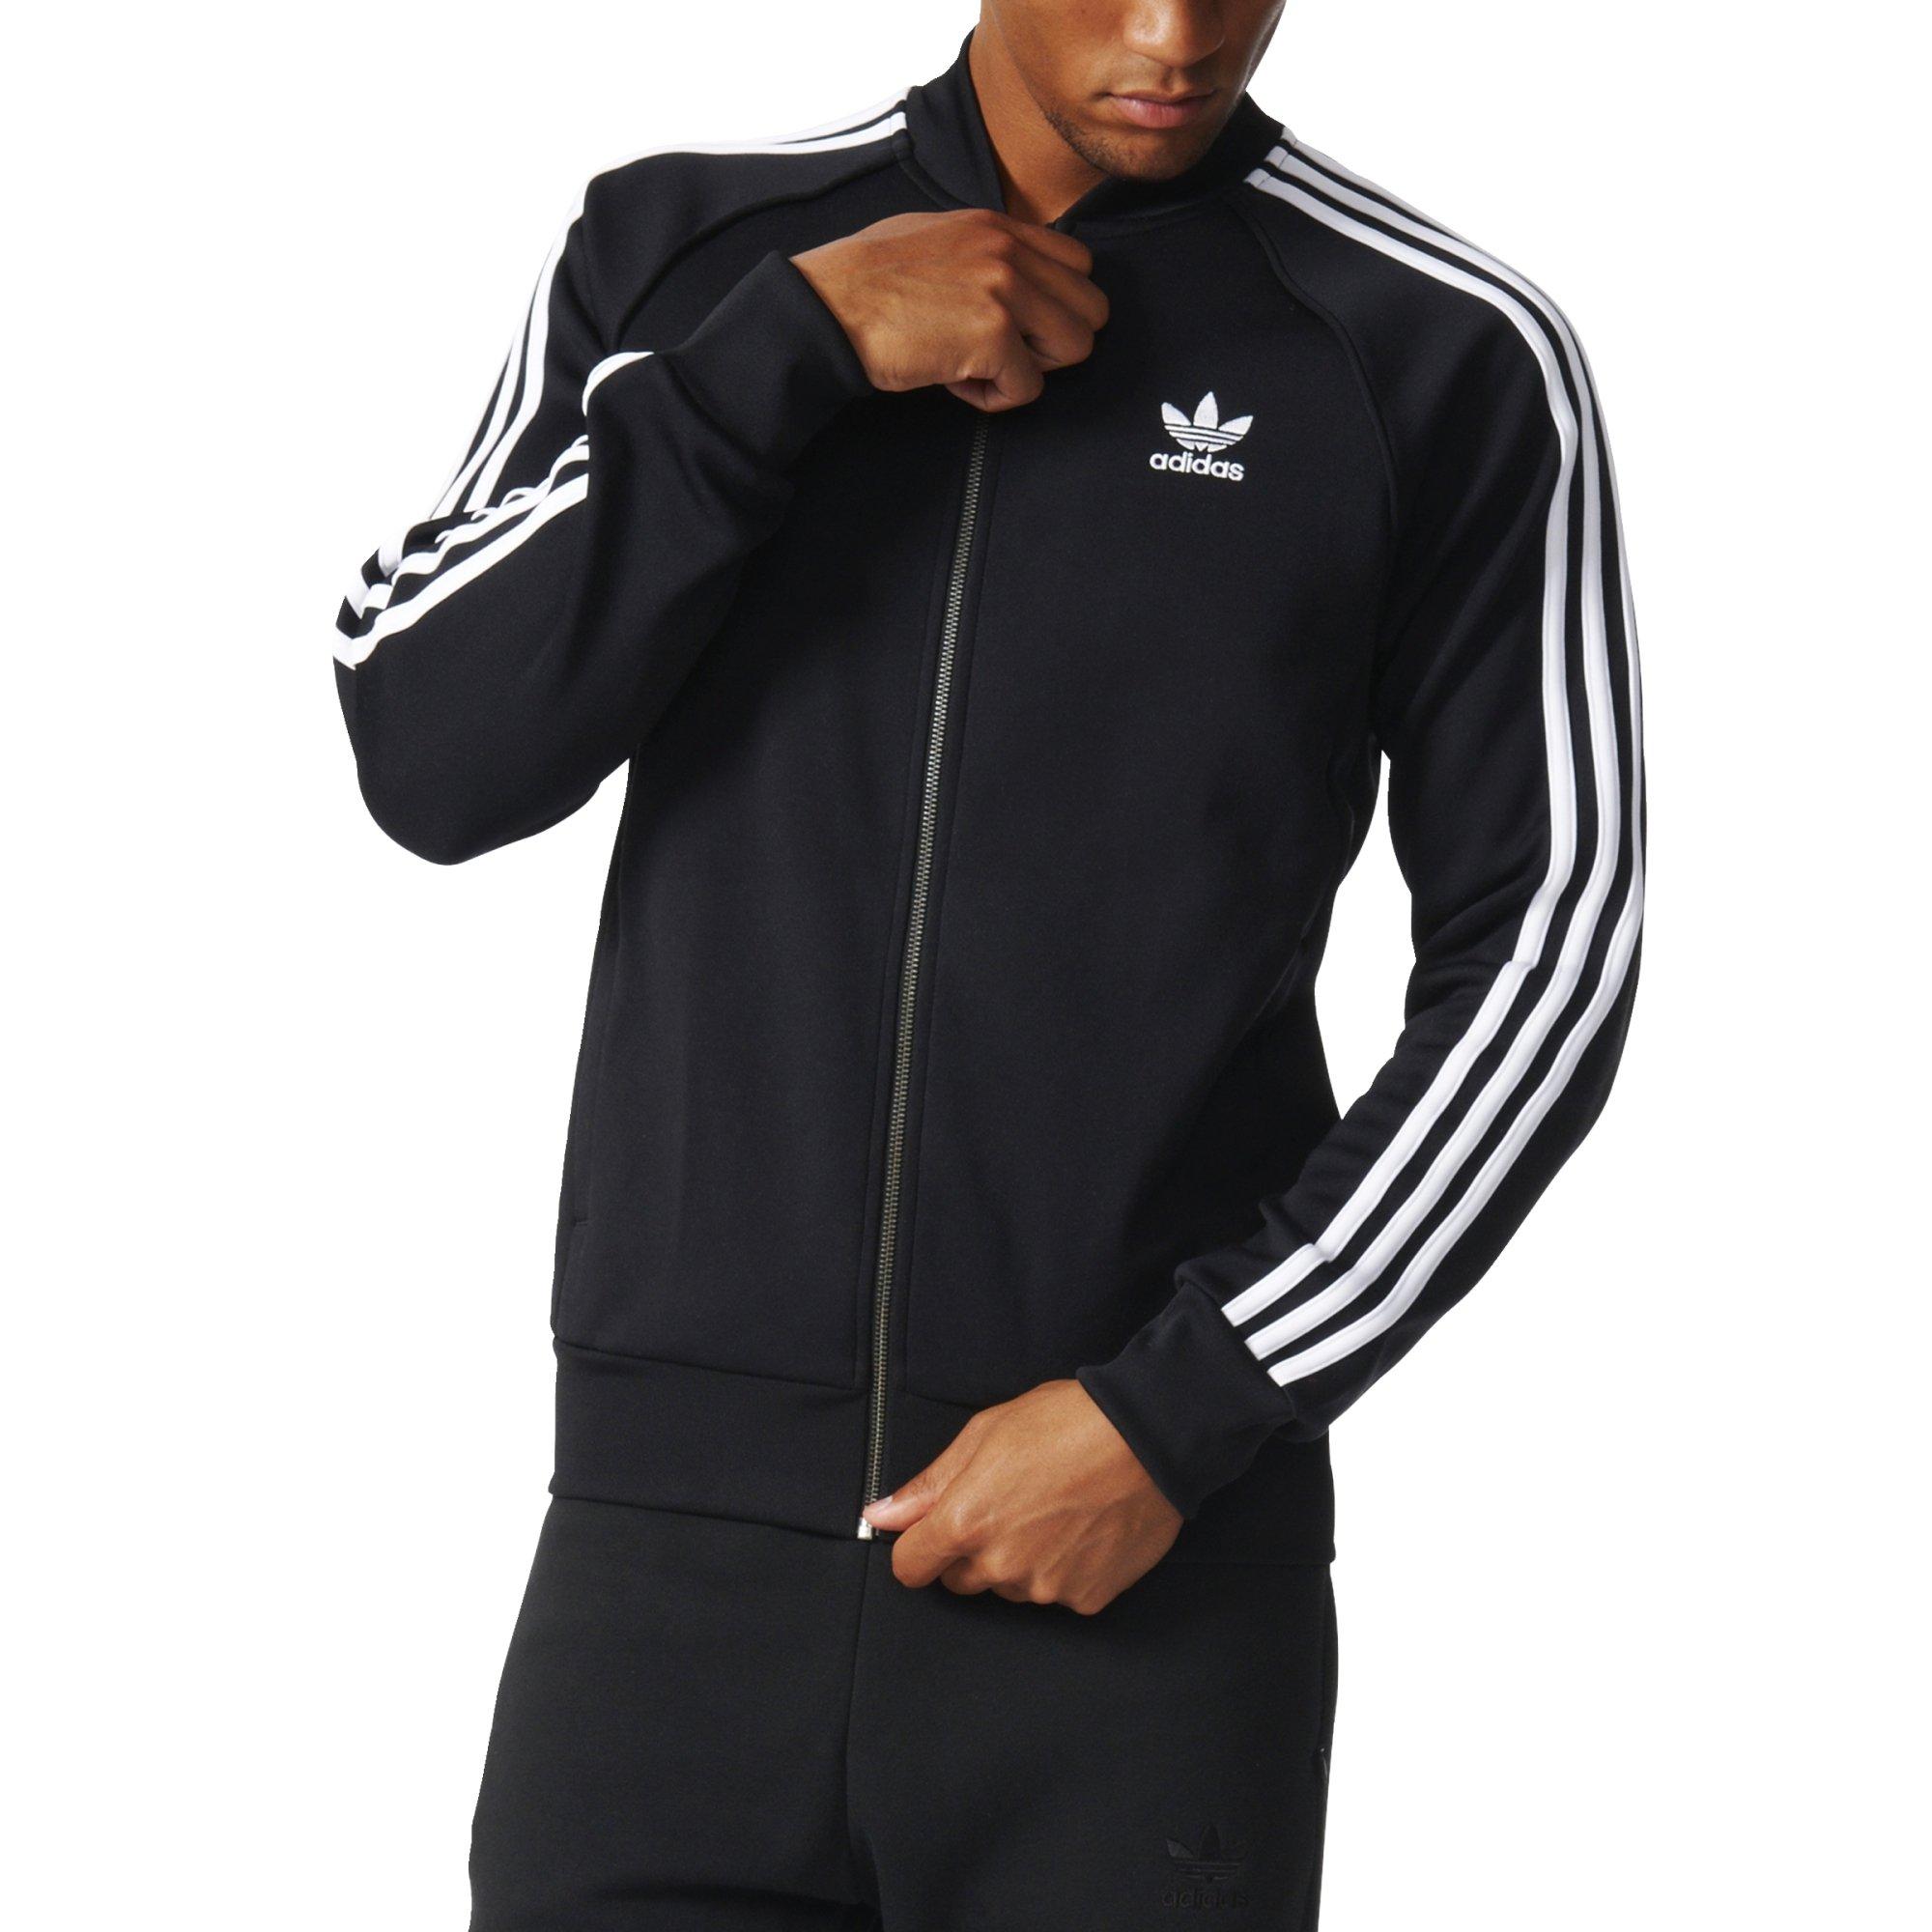 adidas Originals Men's Superstar Track Jacket, Black, Large by adidas Originals